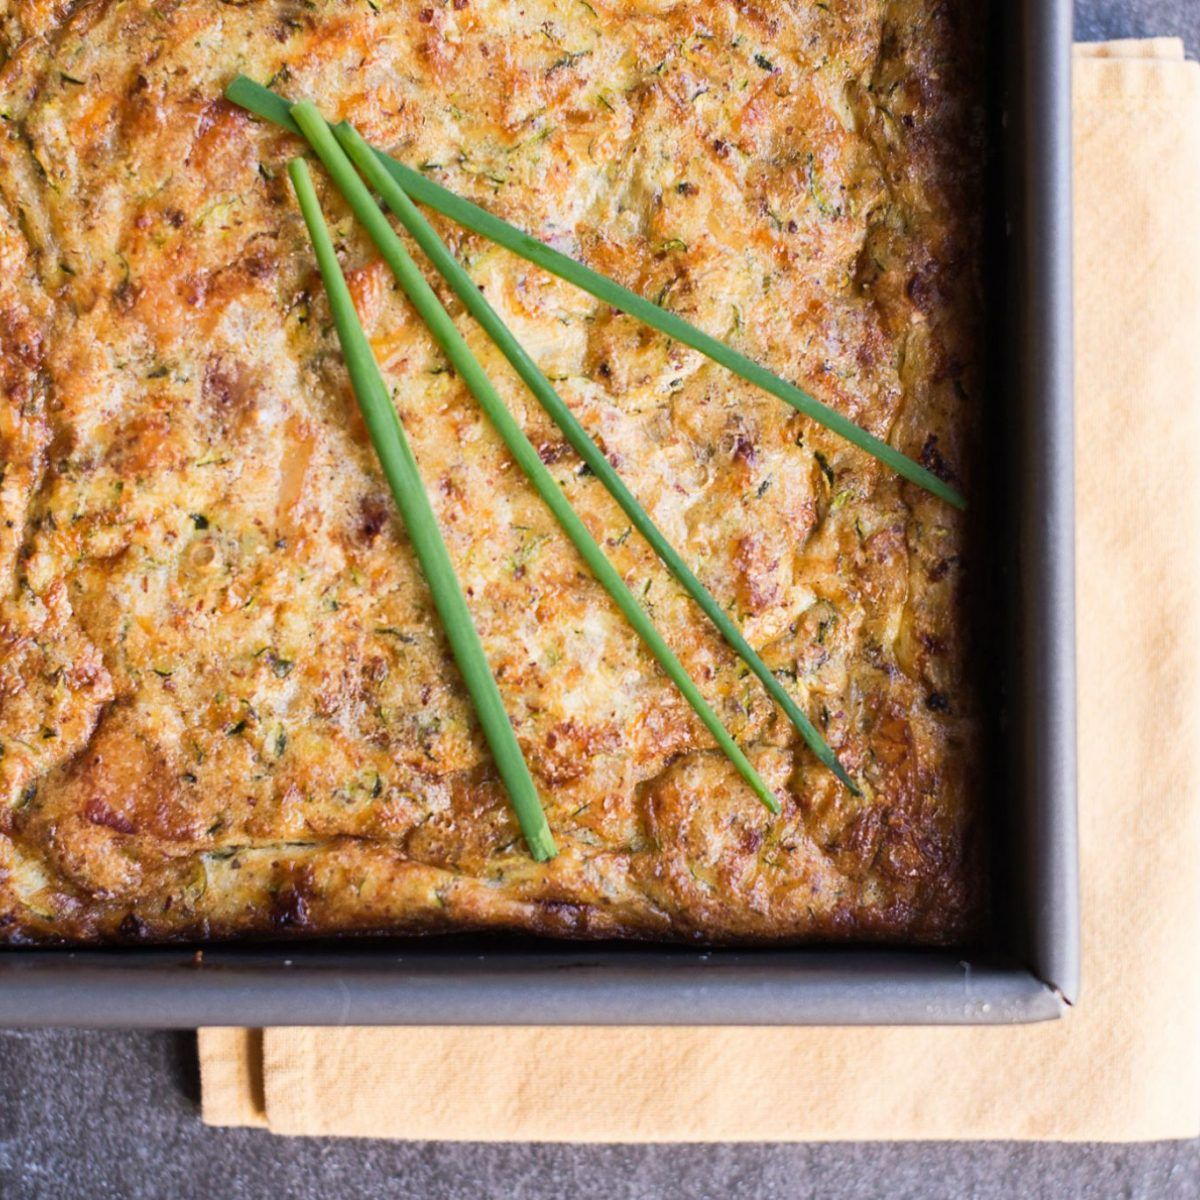 1 Keto Casserole Recipe Low Carb And Gluten Free Recipe In